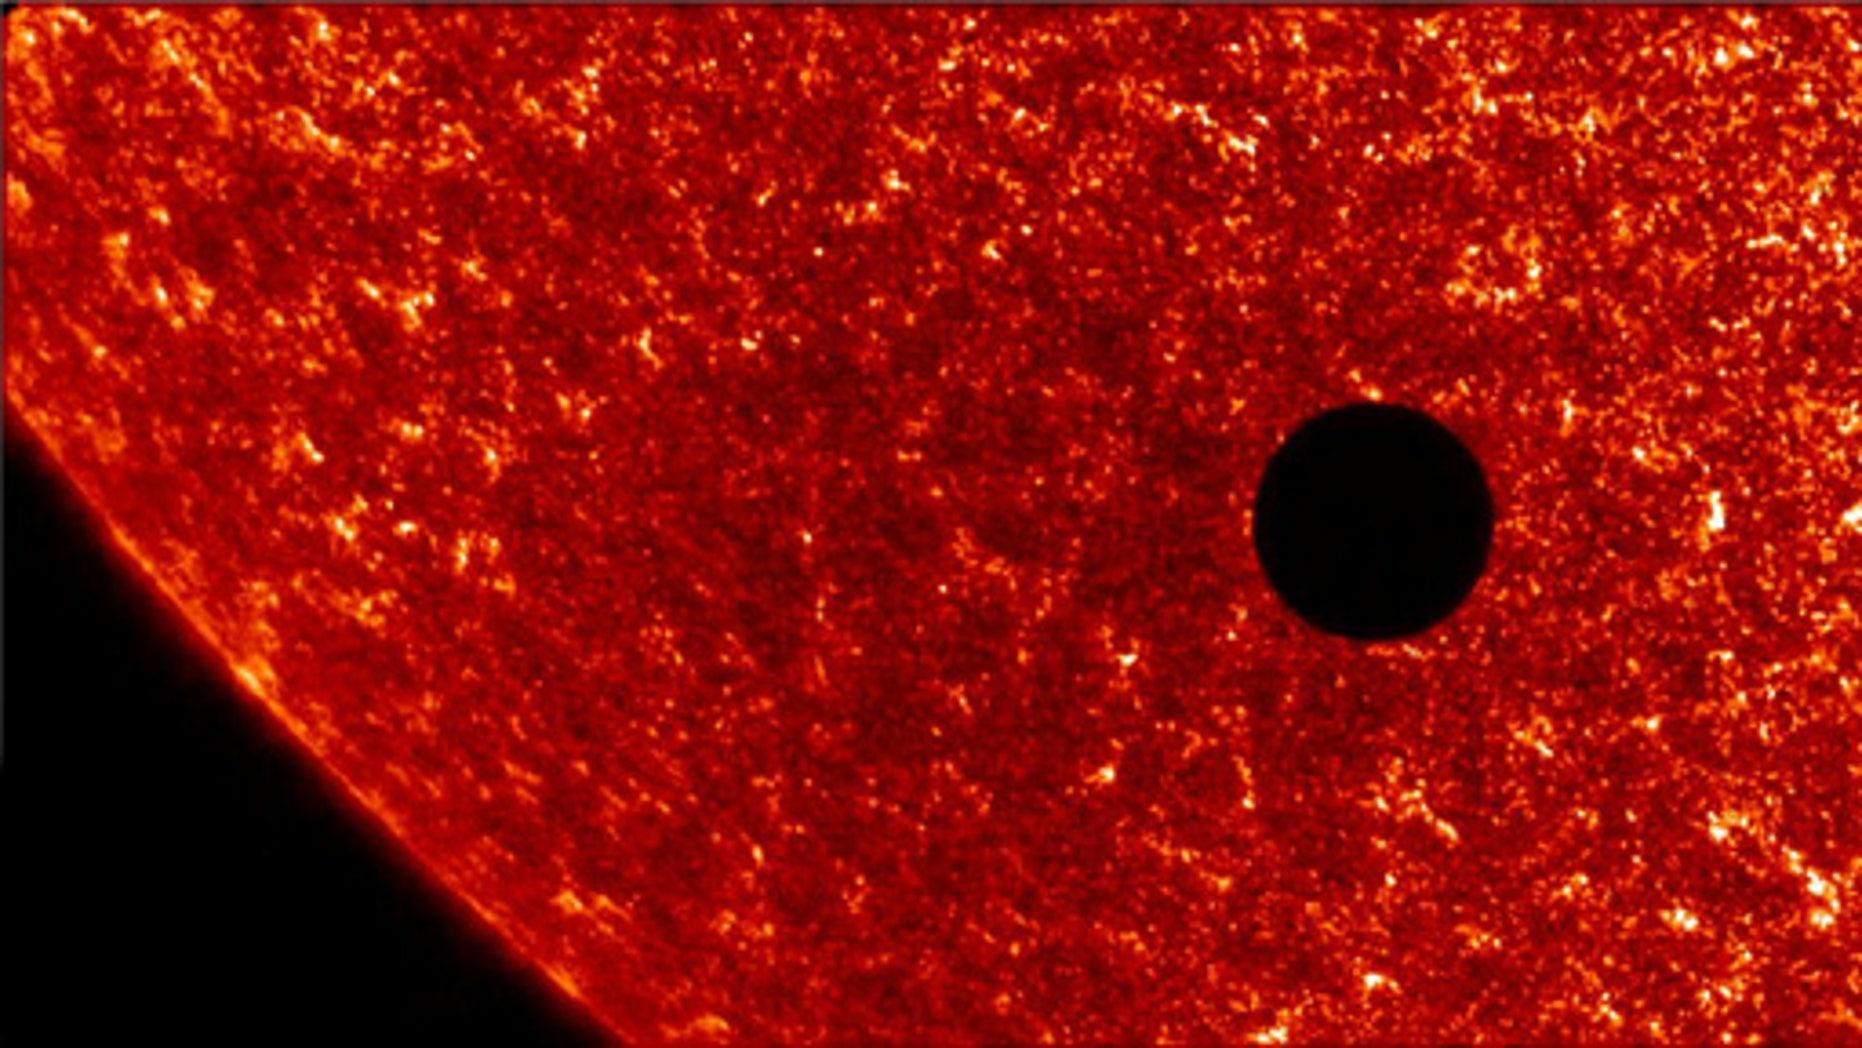 In 2004, Venus passed across the face of the sun. June 5, 2012 is the last transit of Venus until 2117.